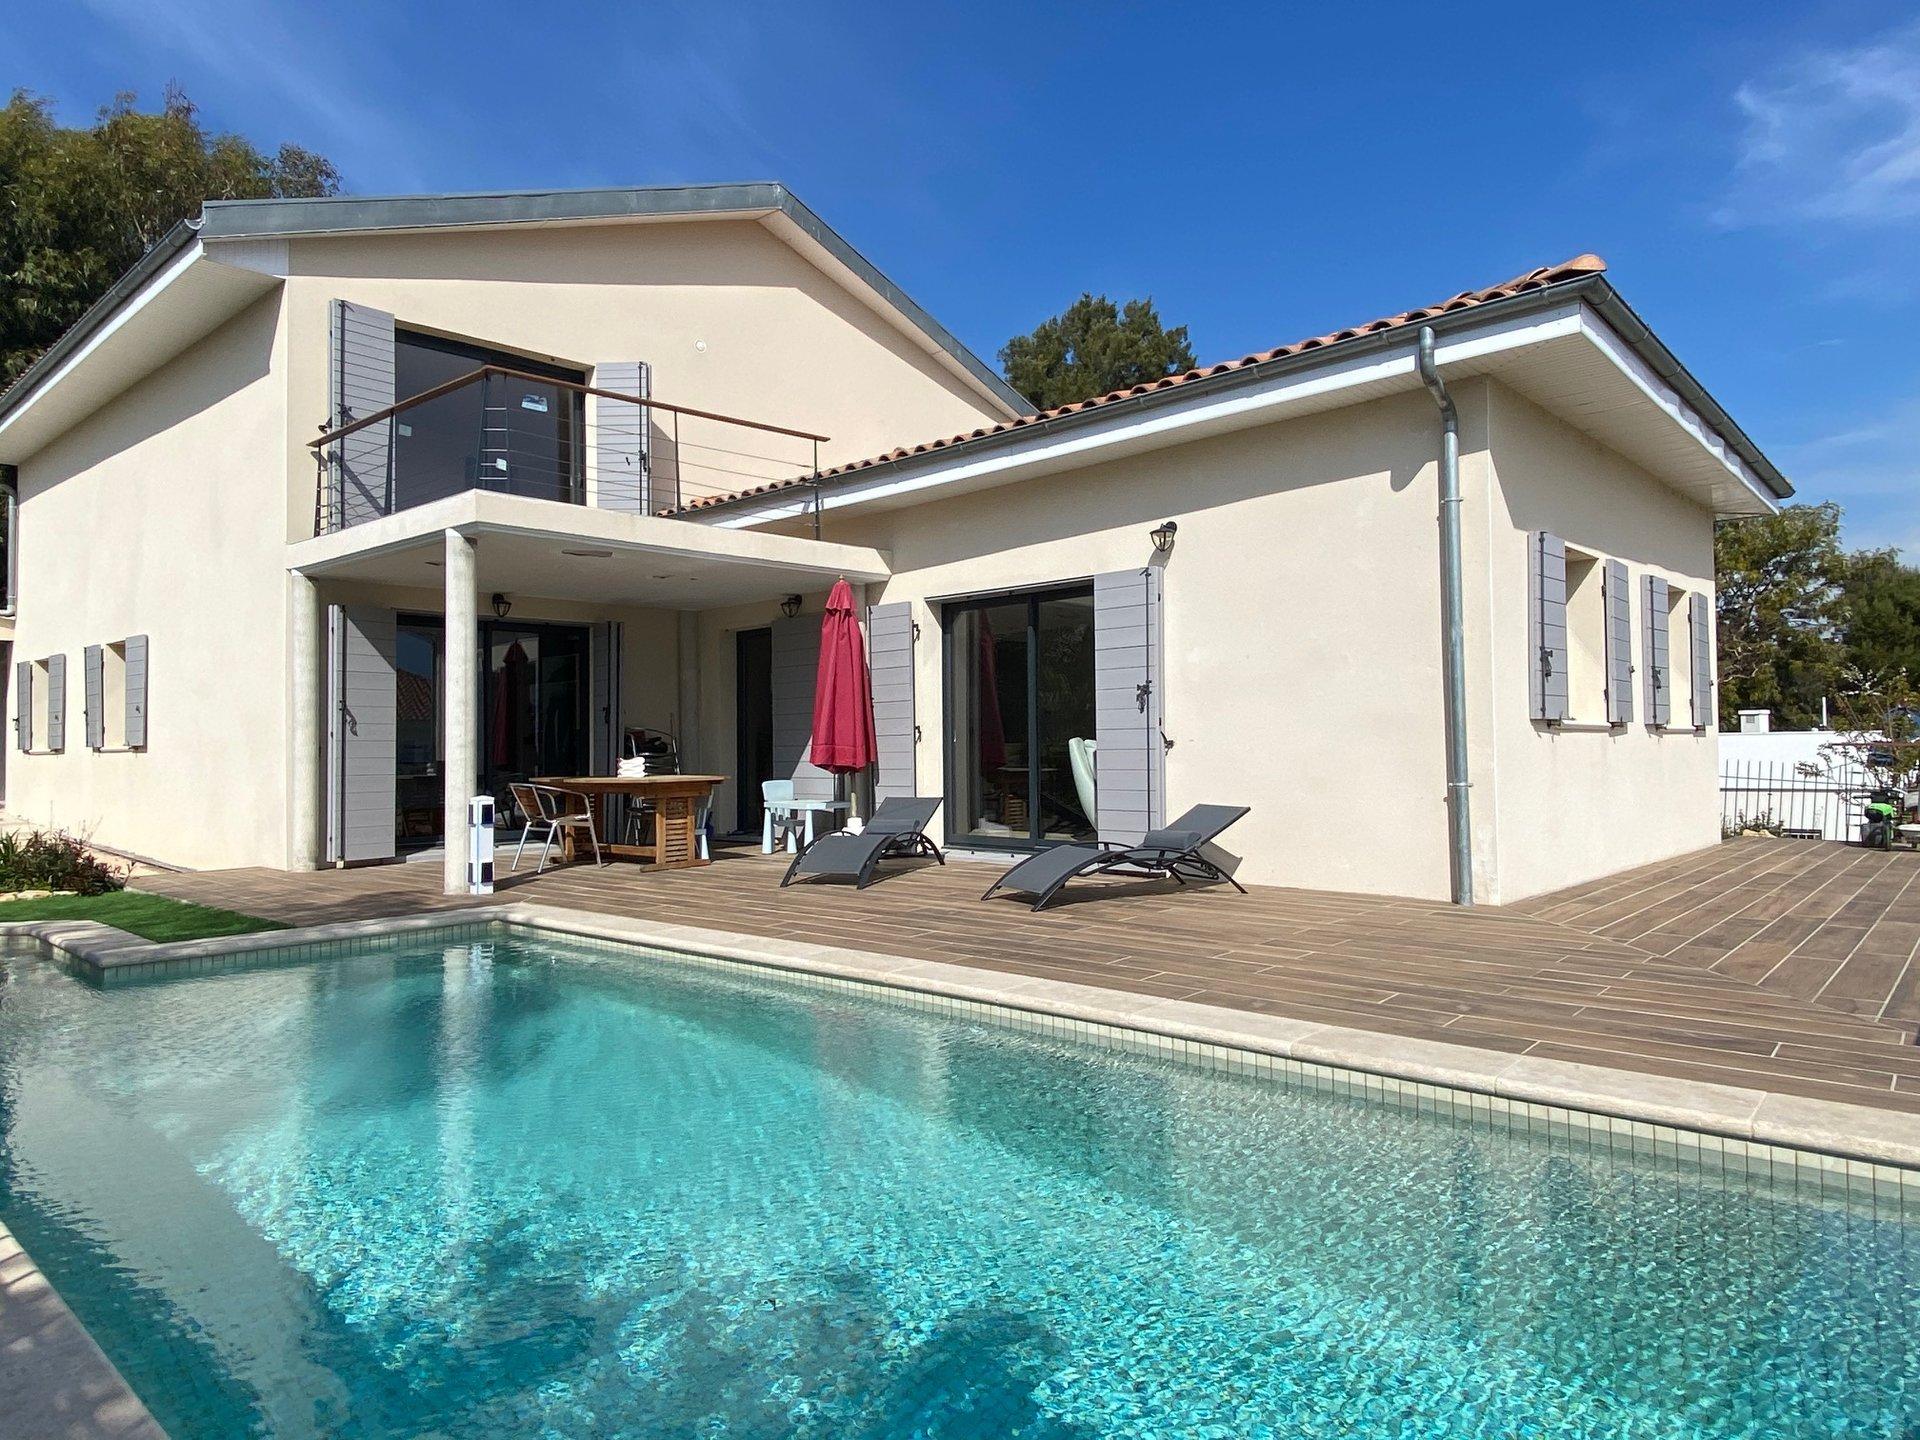 Villa Contemporaine Vue Mer - Cagnes sur mer